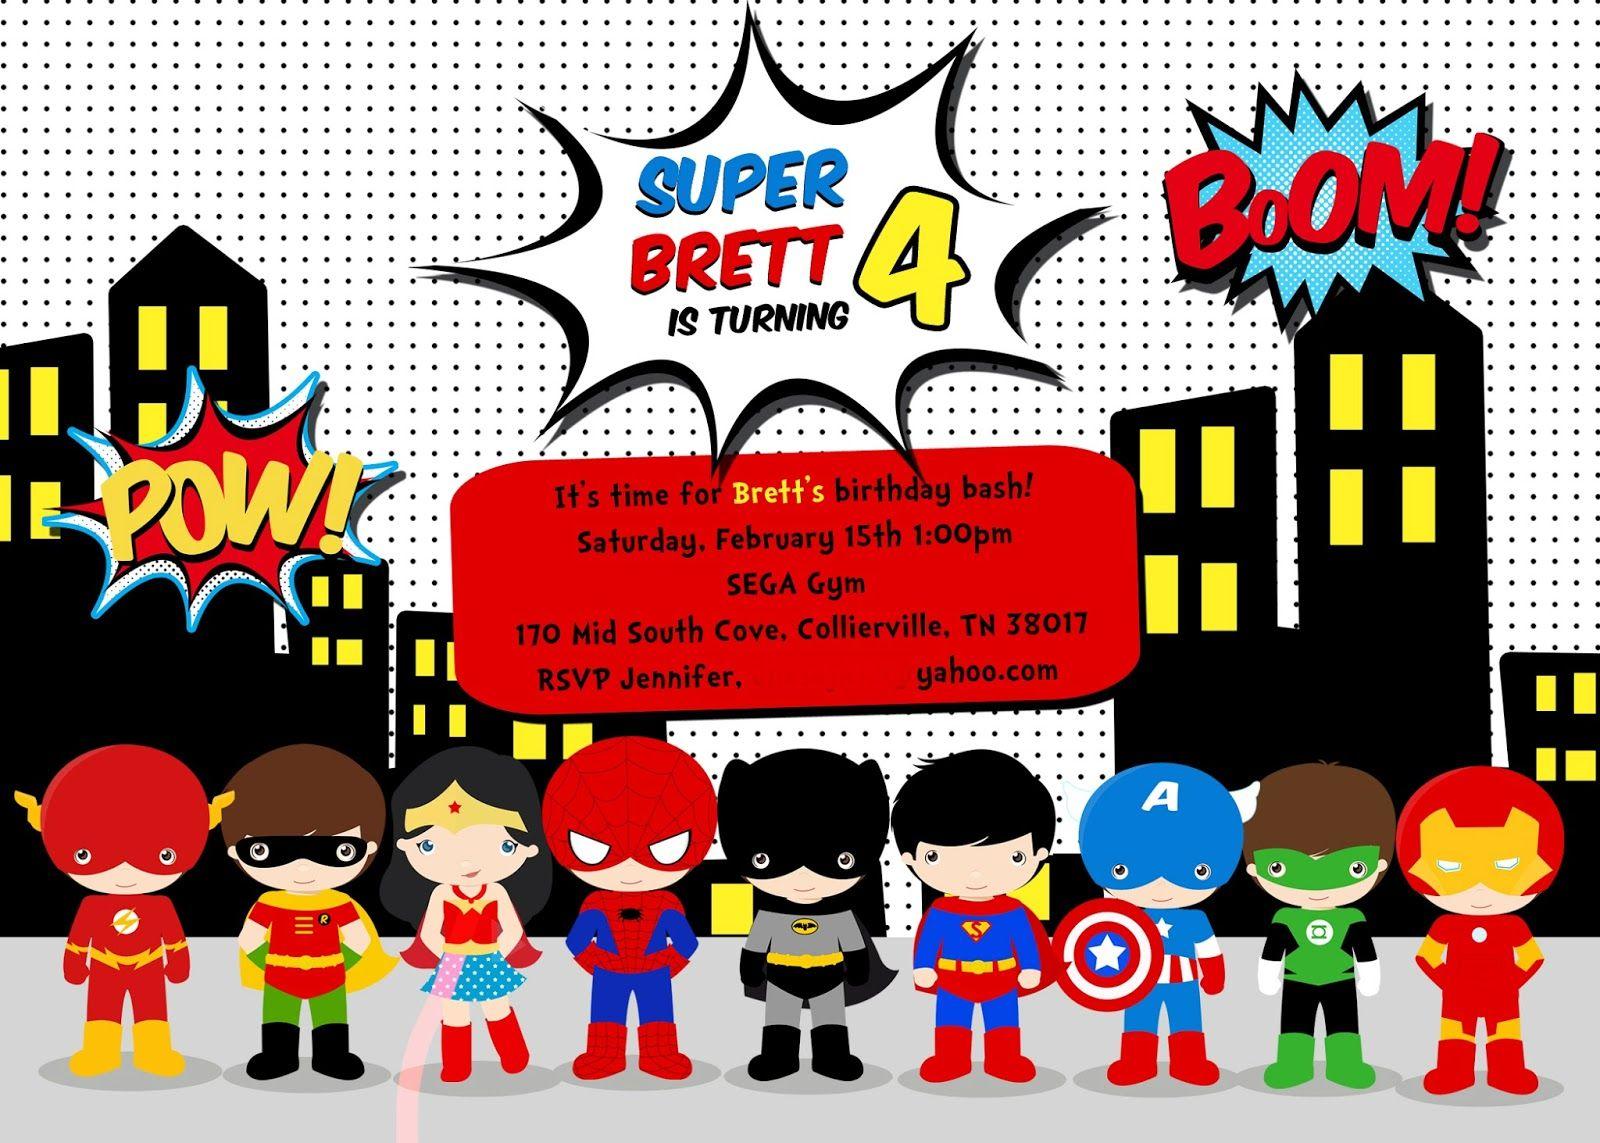 greygrey designs my parties brett s superhero 4th birthday party